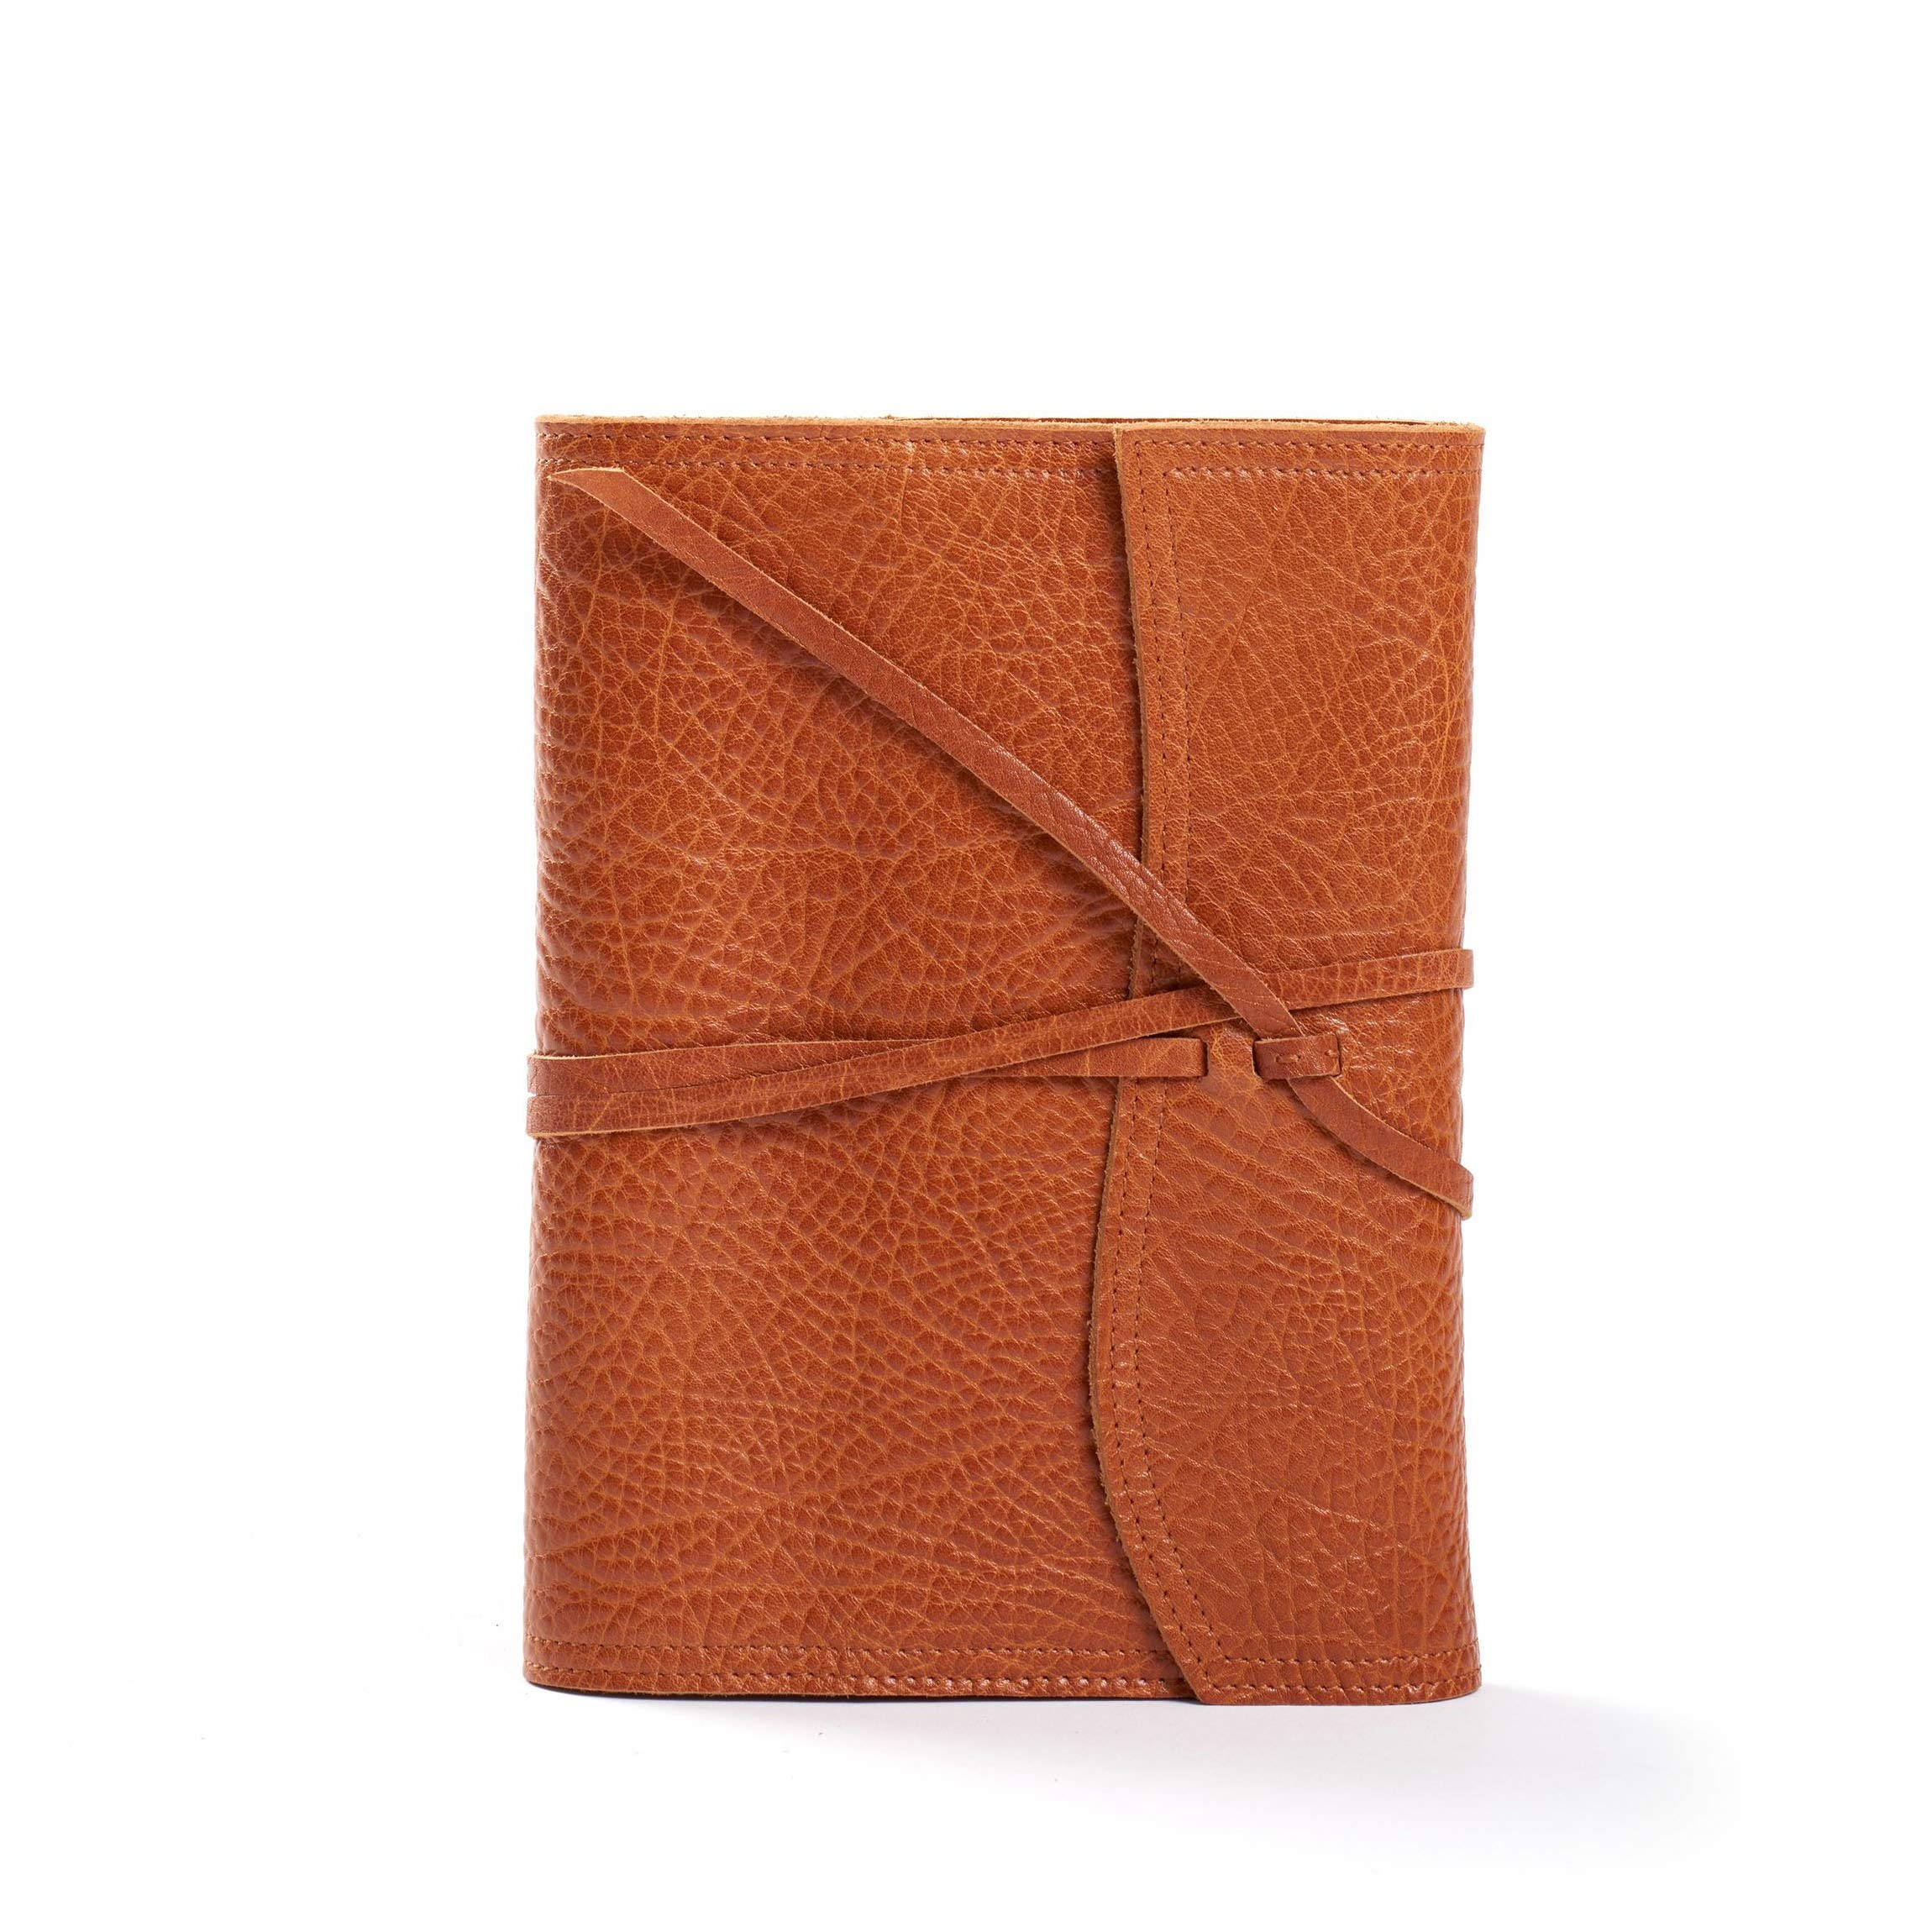 Medium Wrap Journal - Full Grain Italian Leather Leather - Whiskey (Brown)